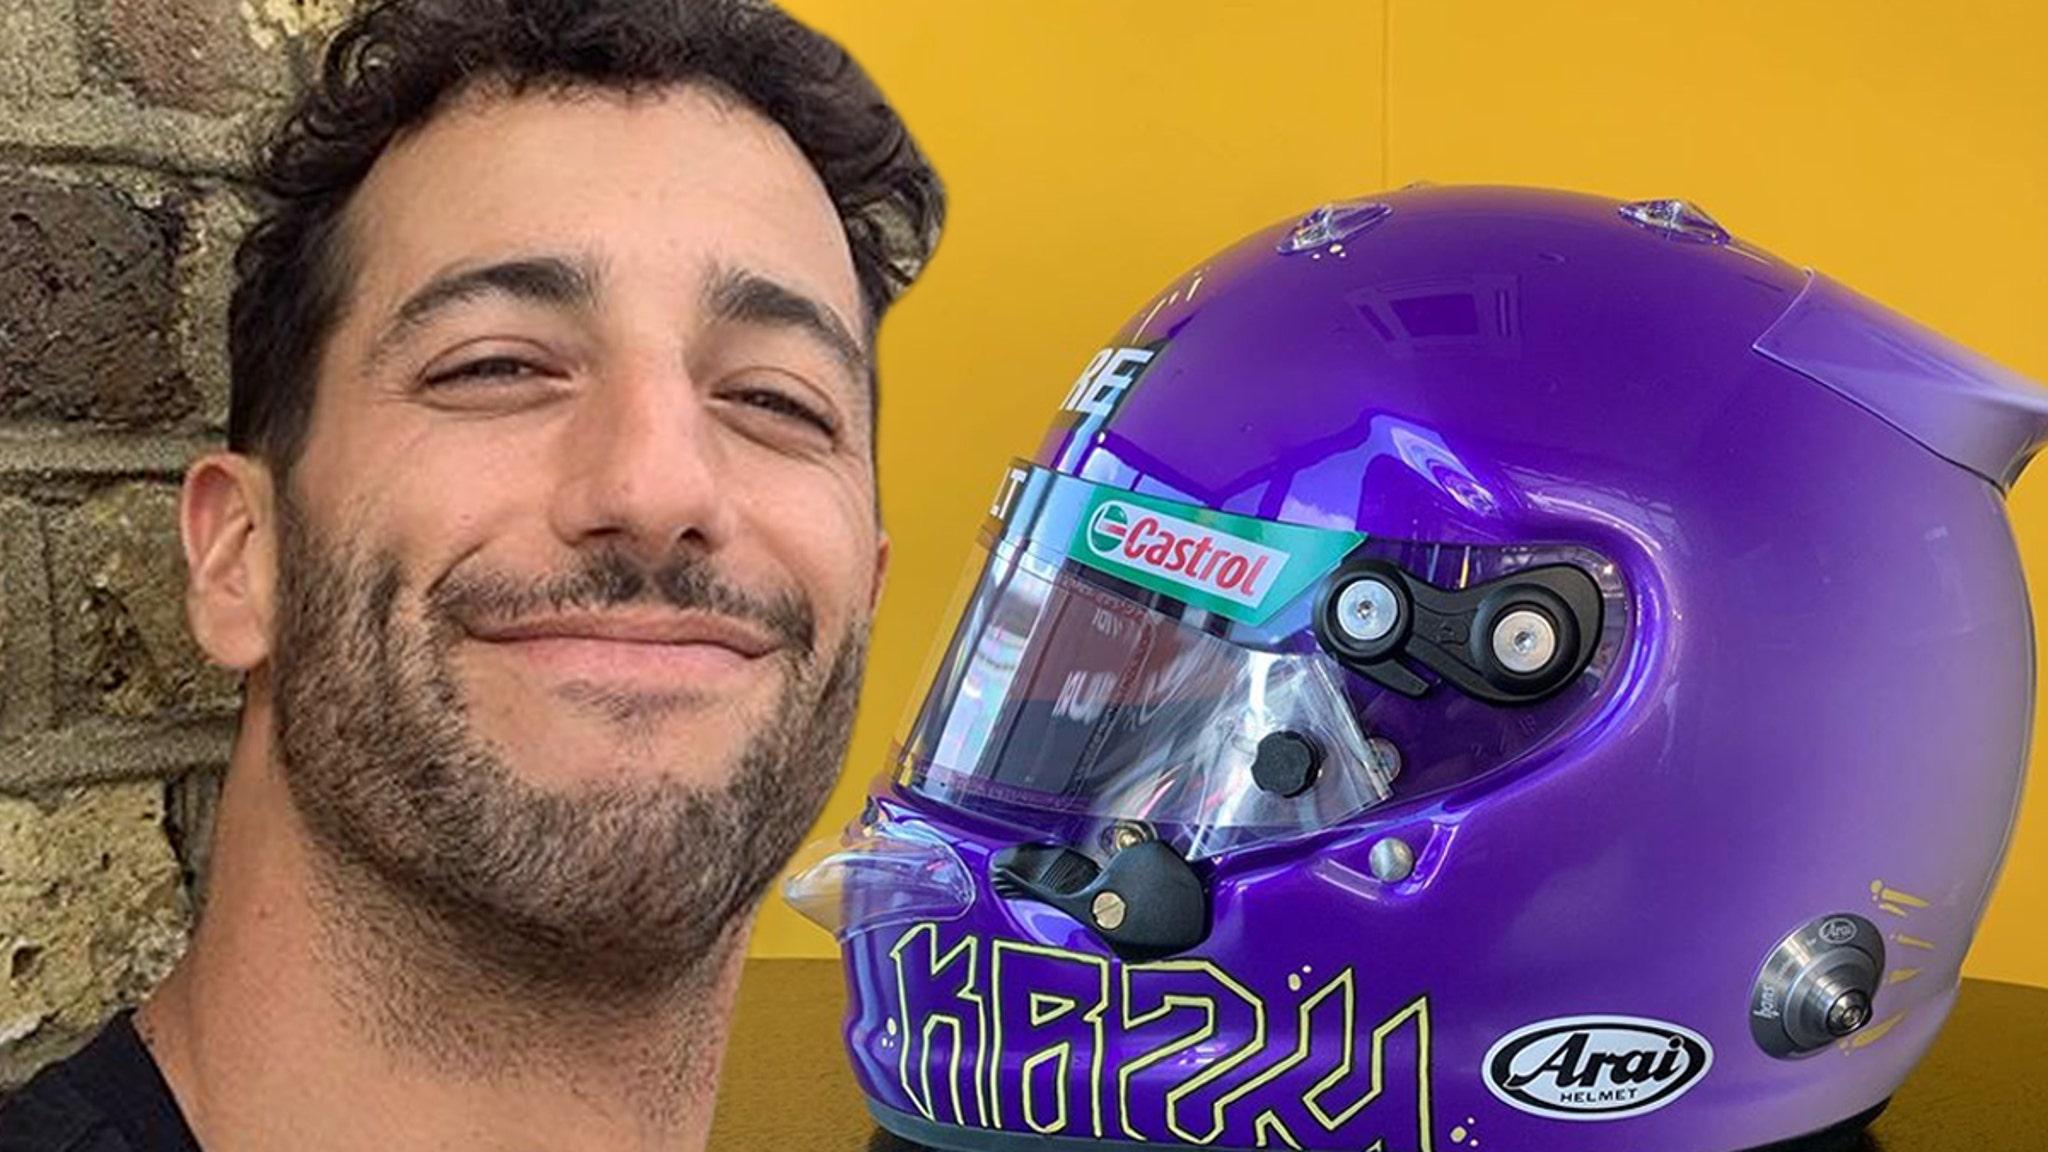 F1 Superstar Daniel Ricciardo Honors Kobe Bryant With Dope Helmet Design